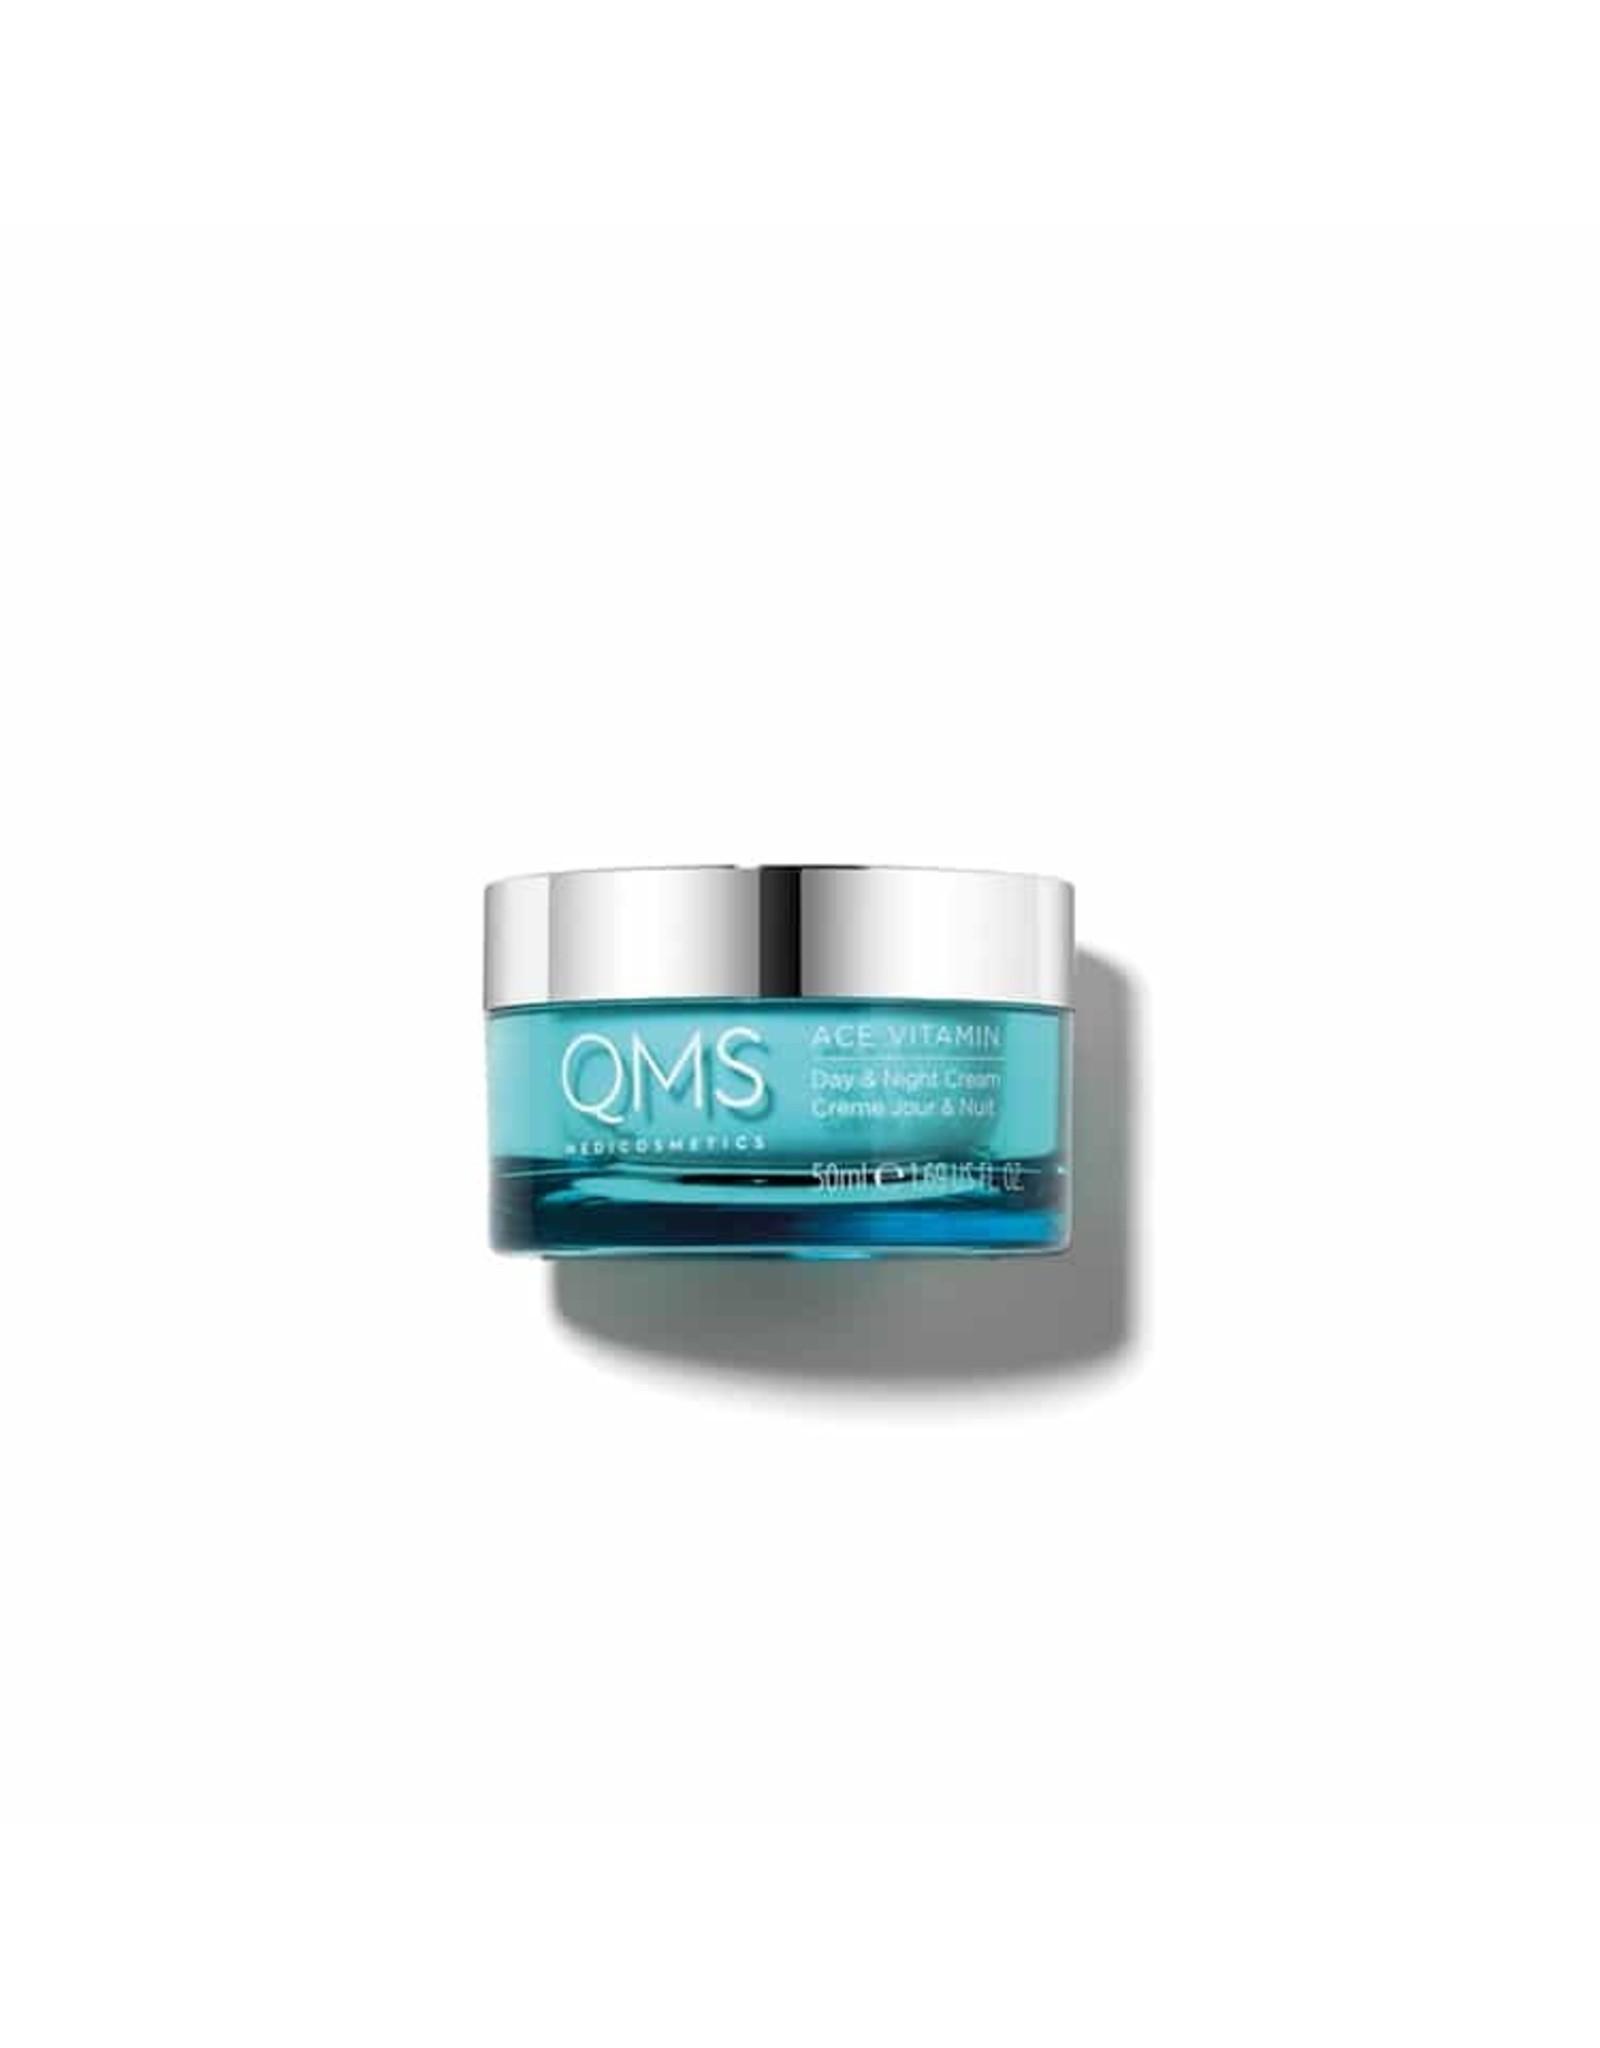 !QMS Medicosmetics Ace Vitamin - Copy